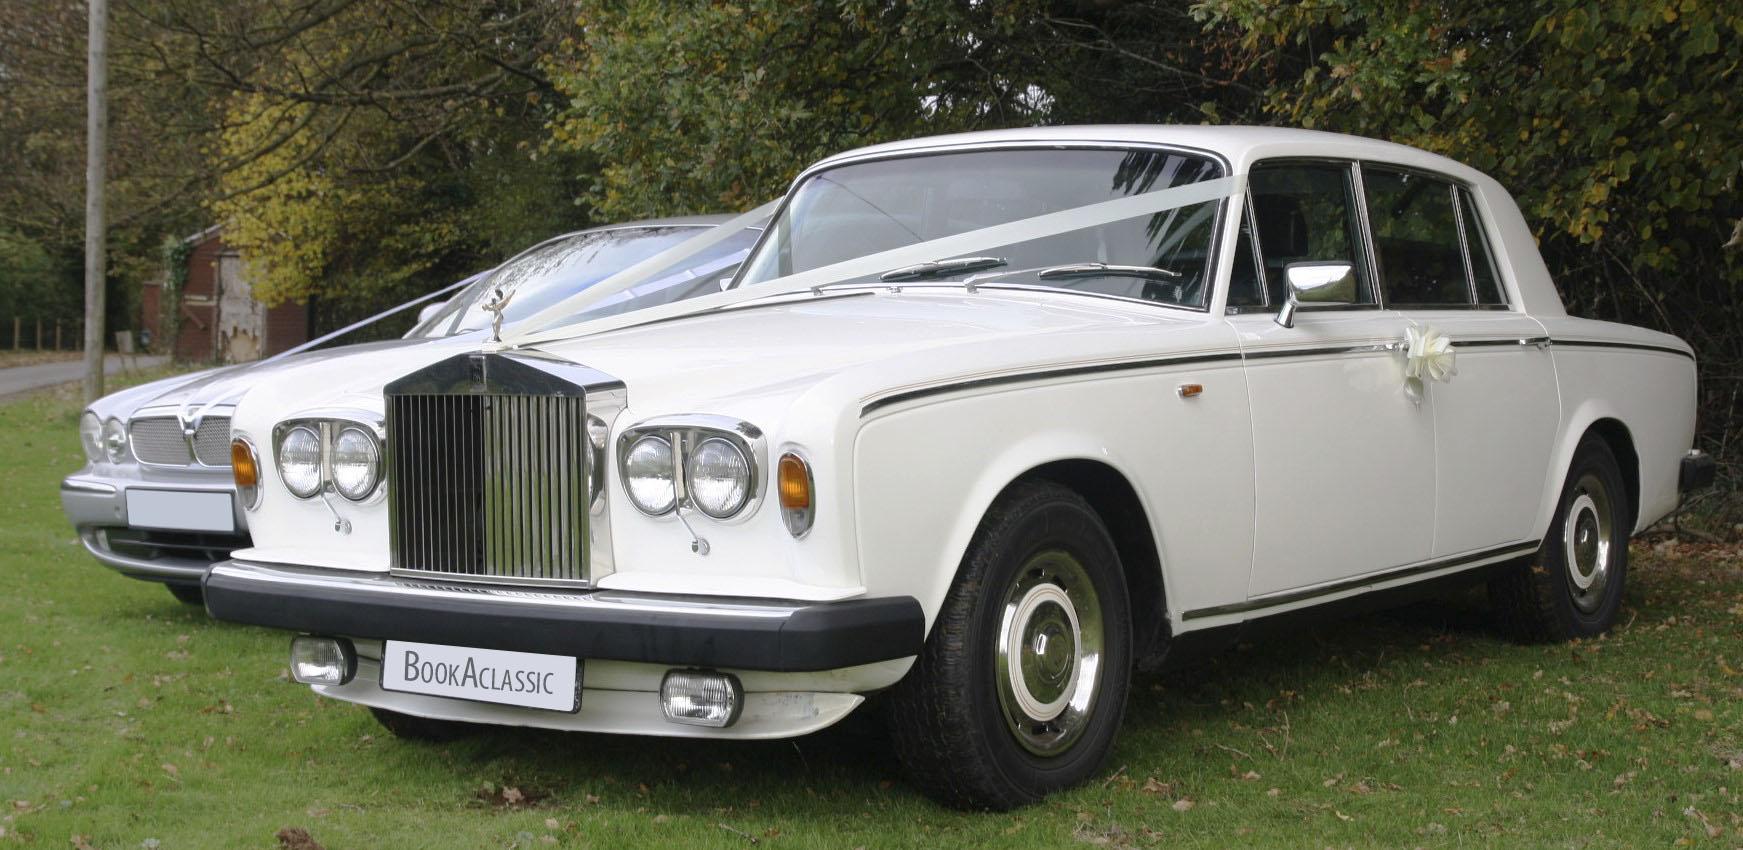 Rolls Royce Silver Shadow 11 Hire Pontllanfraith